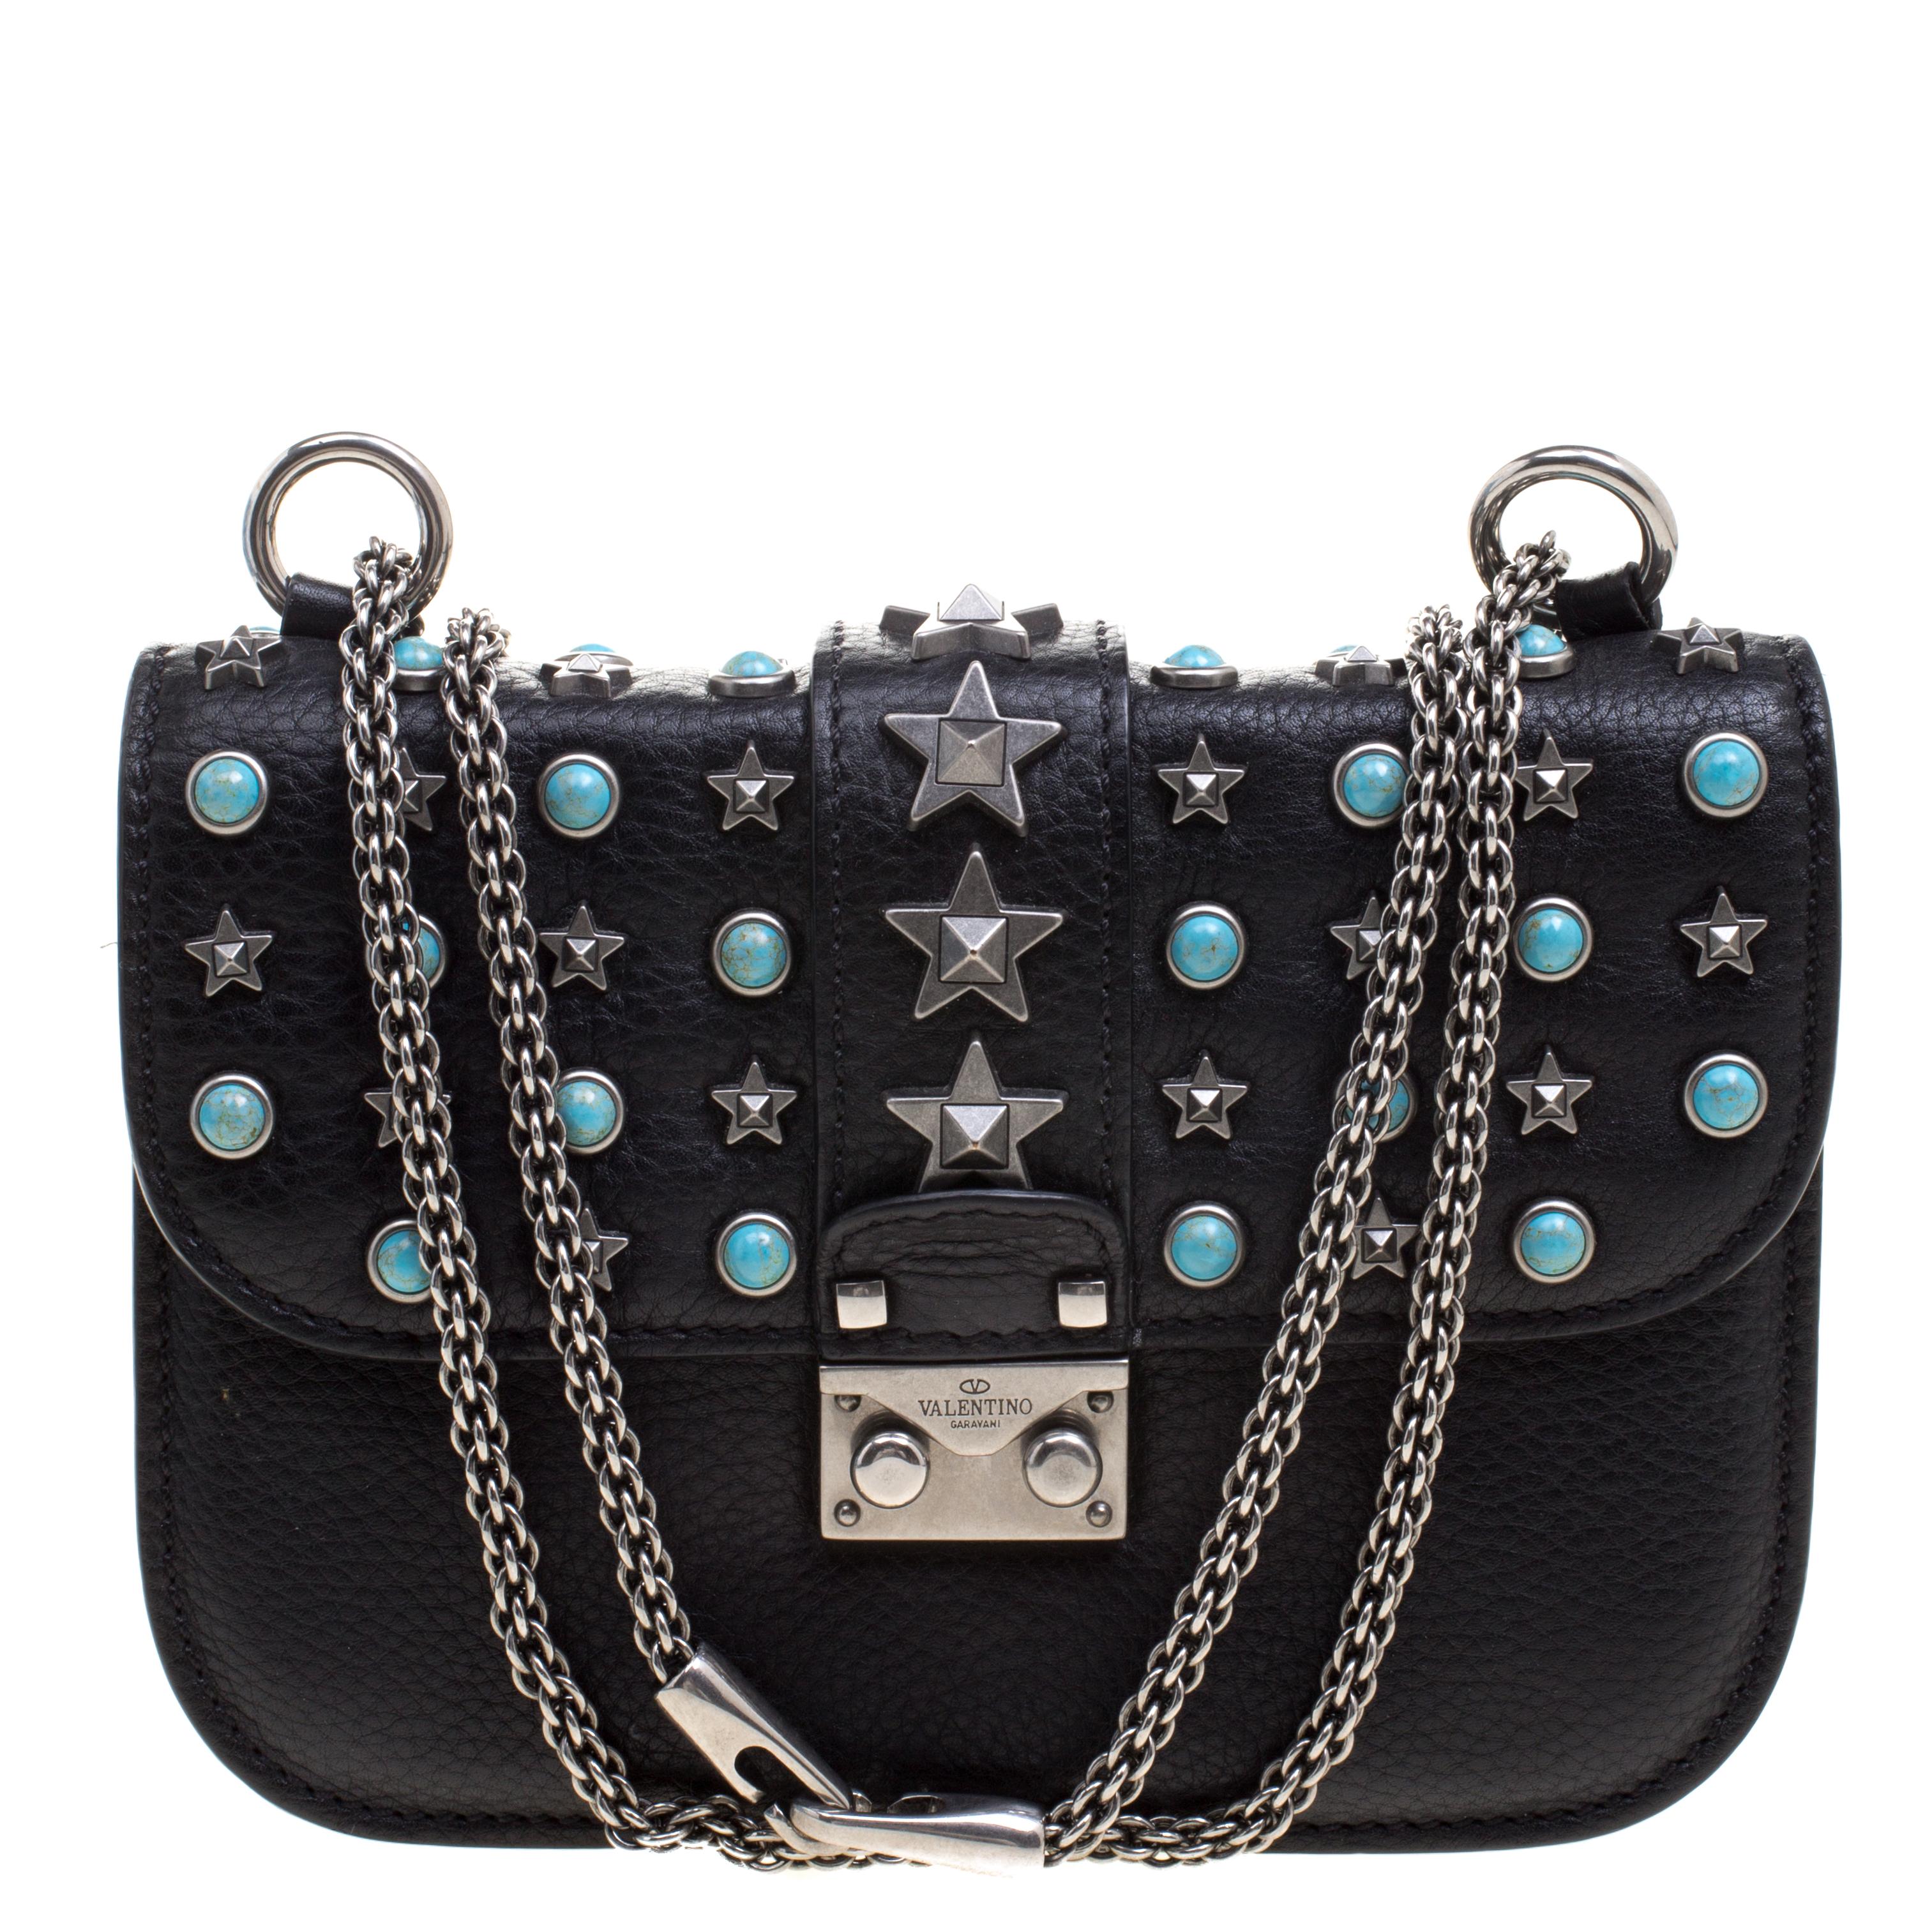 2fc33a24a5 Buy Valentino Black Leather Small Star Rockstud Lock Shoulder Bag ...